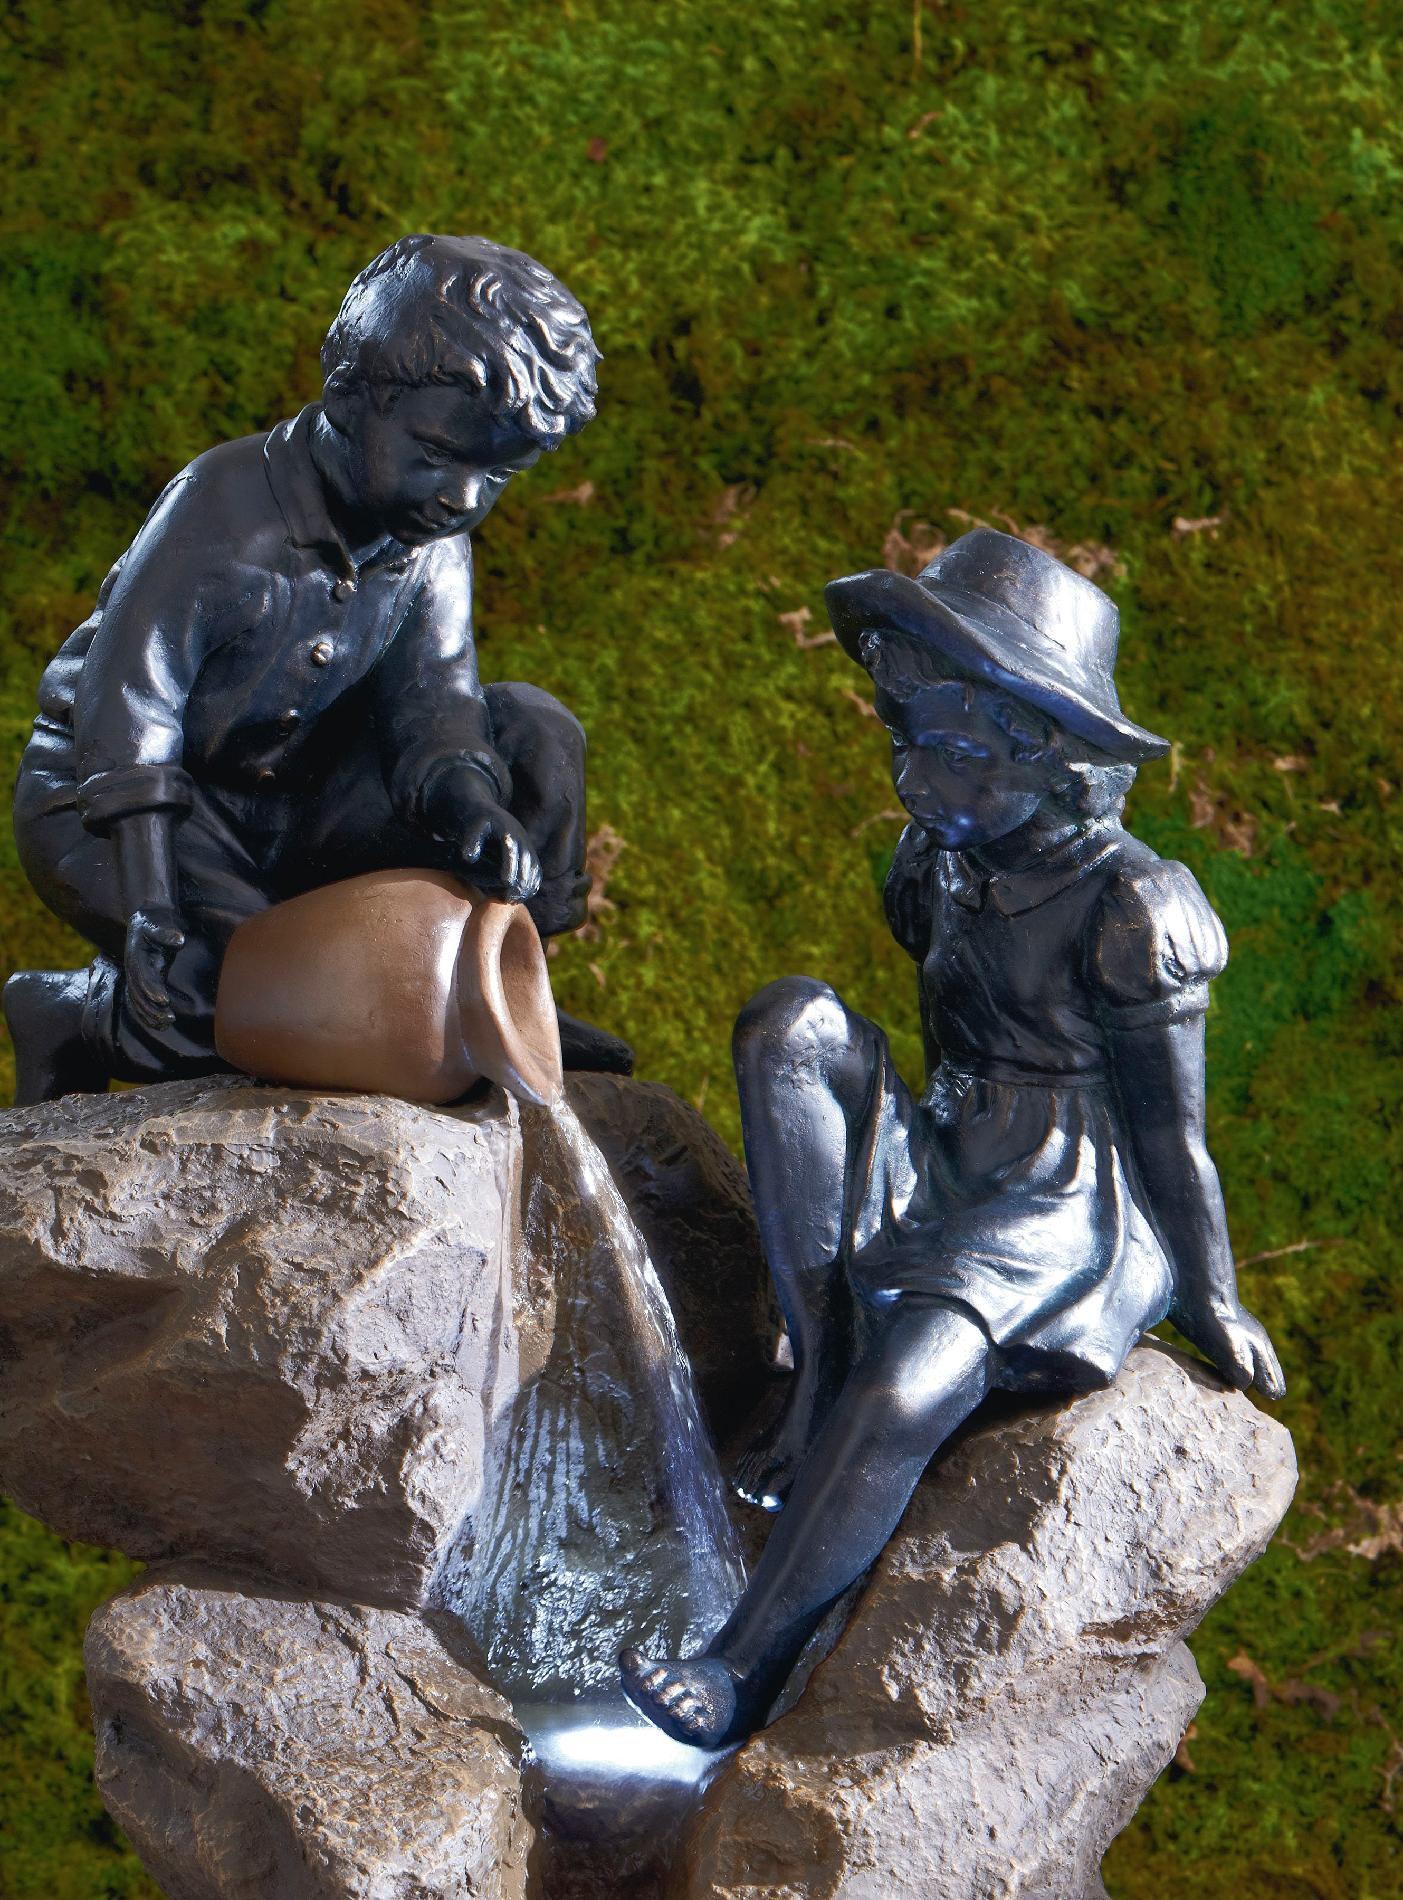 Garden Oasis Boy & Girl on Rocks Fountain